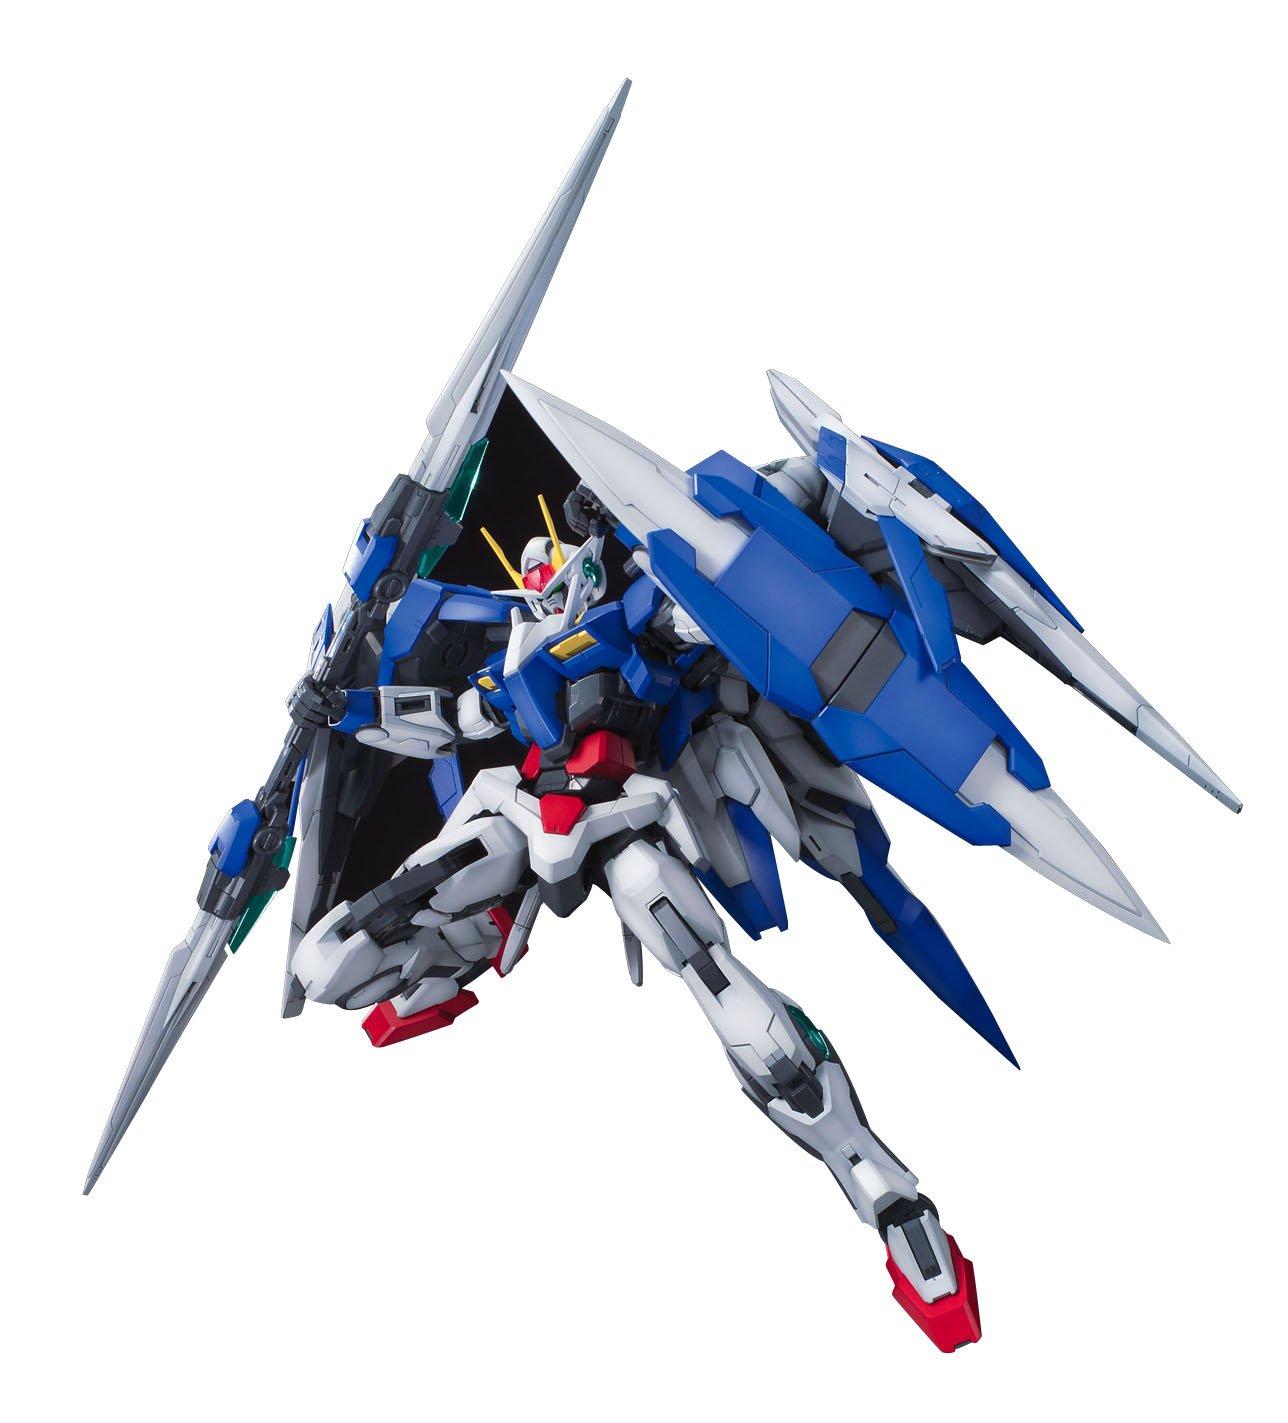 Bandai Hobby MG 00 Raiser Modellbausatz, Maßstab 1:100